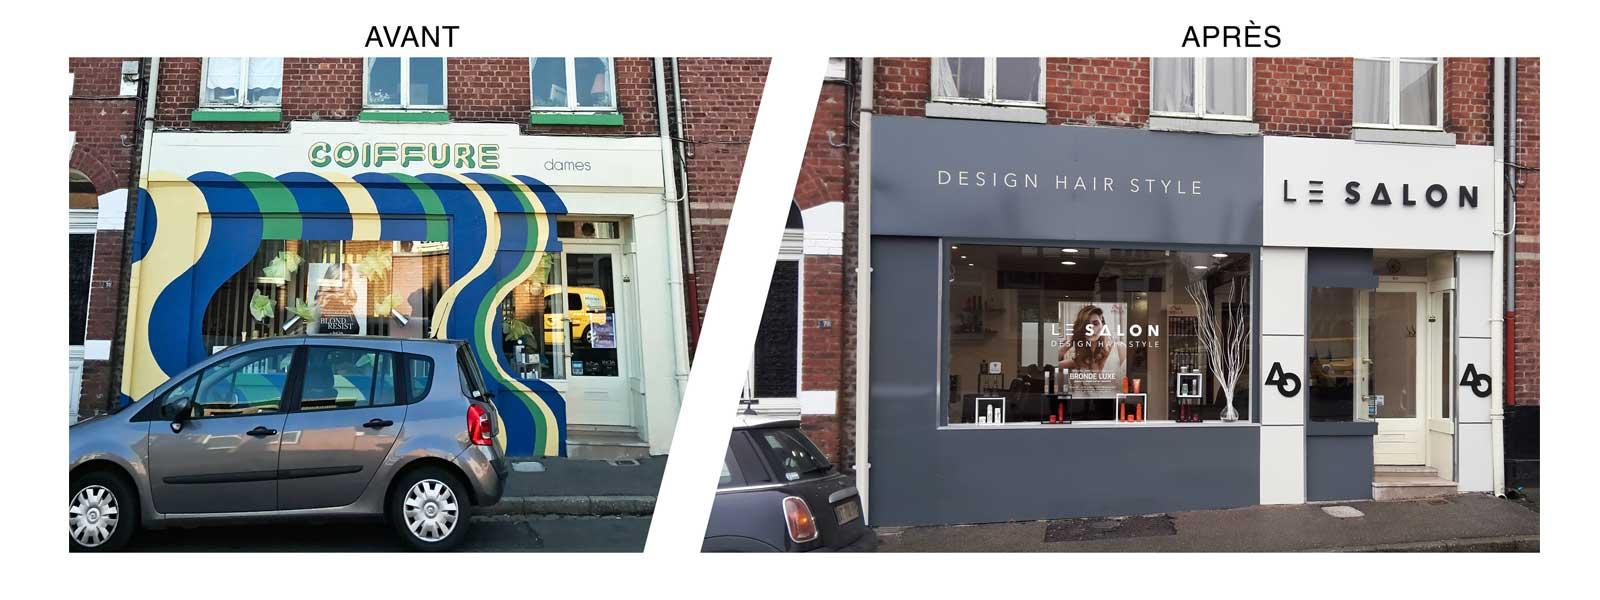 Habillage fa ade de magasin fabrication et pose d 39 enseigne for Grossiste decoration interieur